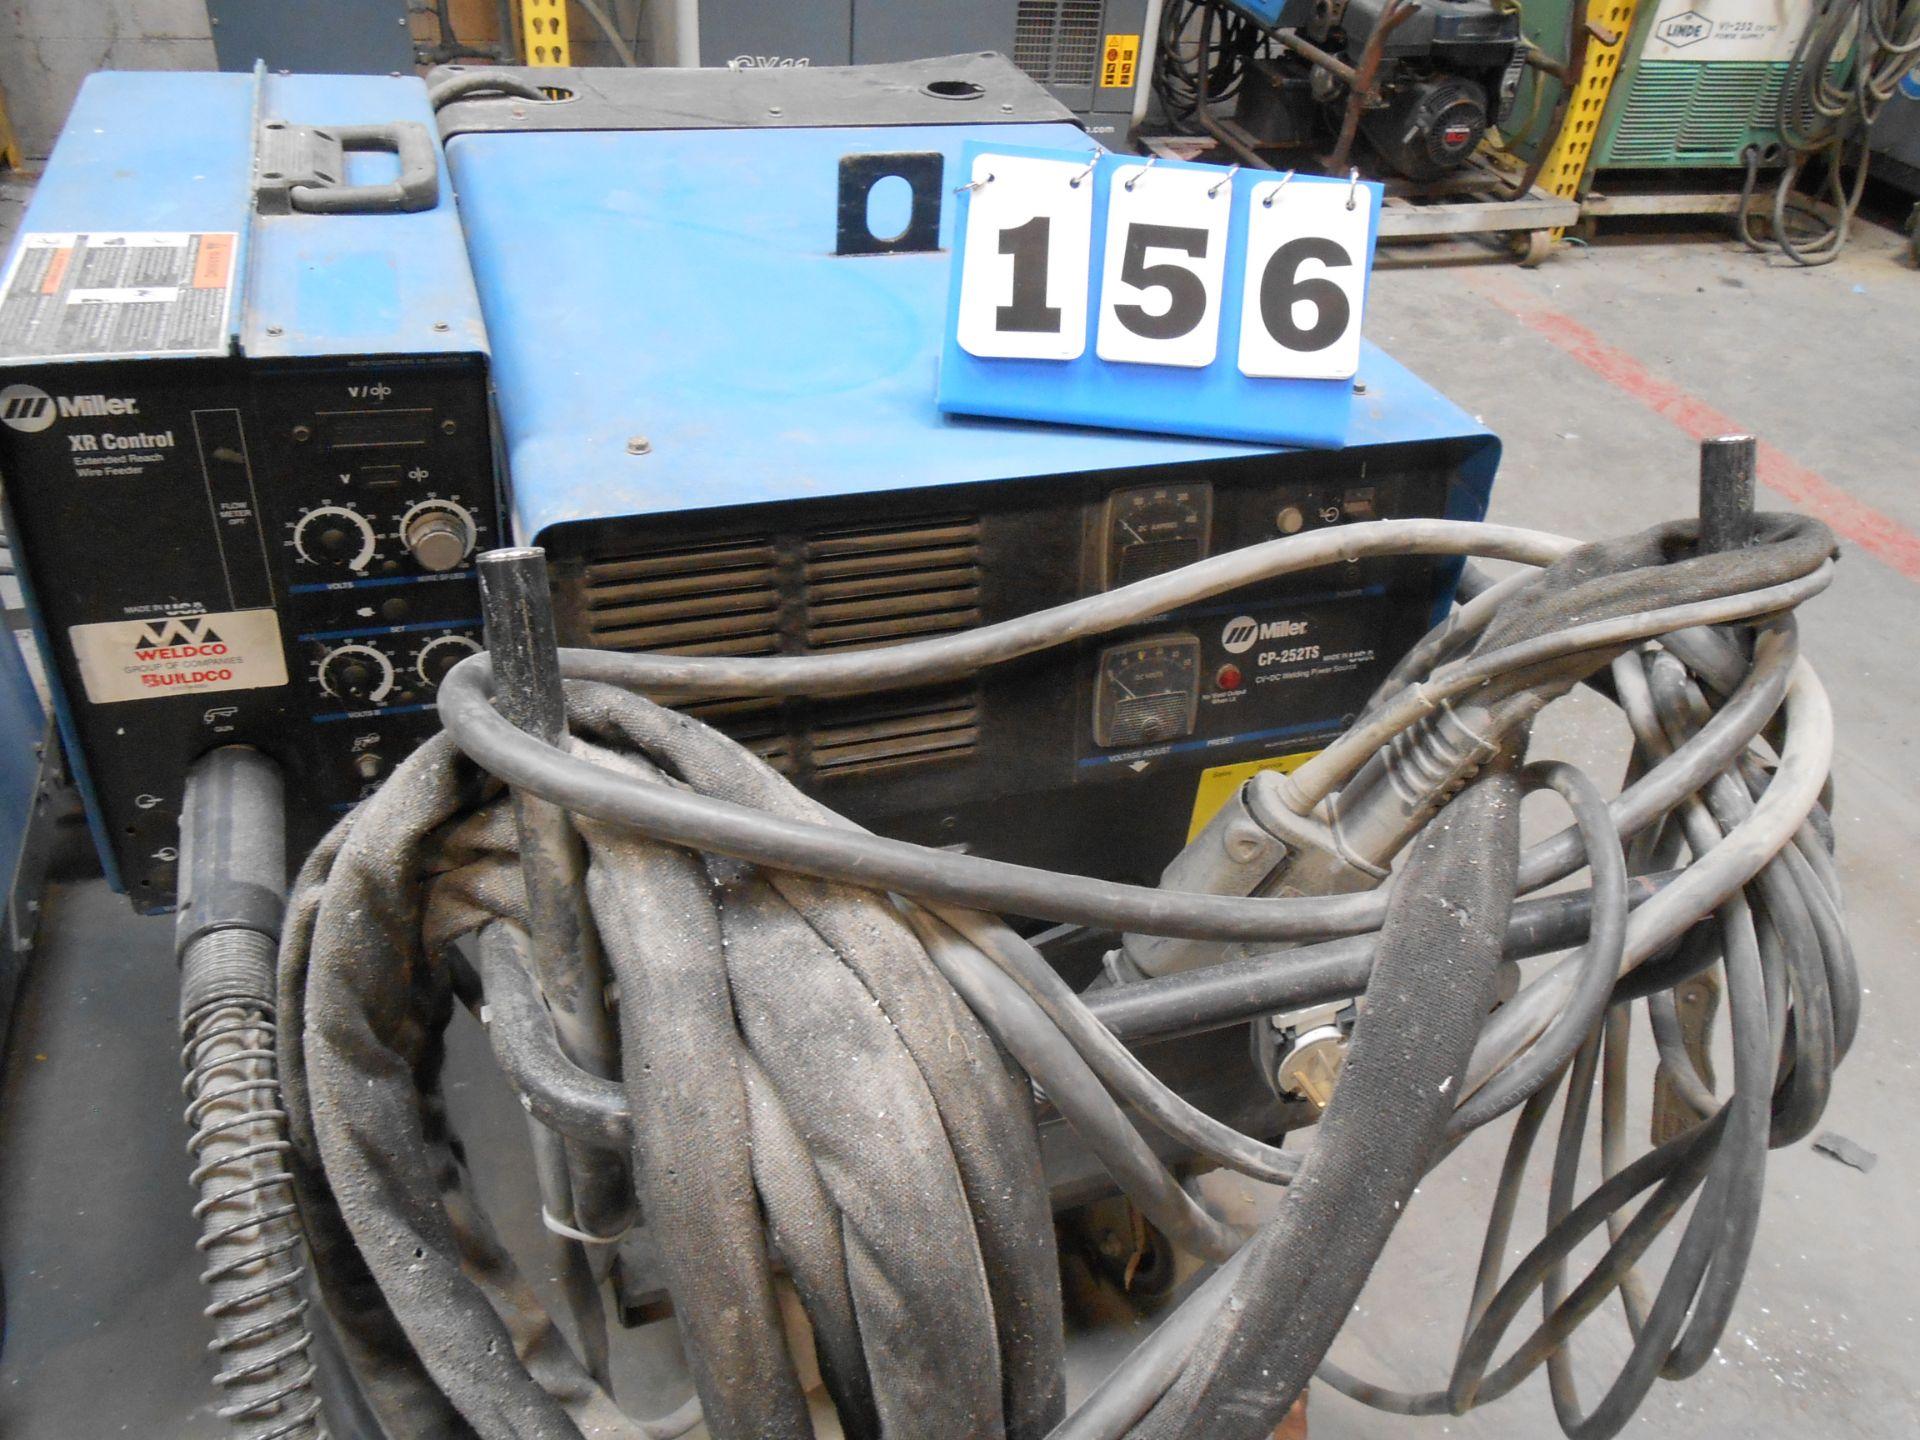 Lot 156 - Miller CP-252-TS Welder w/XR Extended Wire Feeder